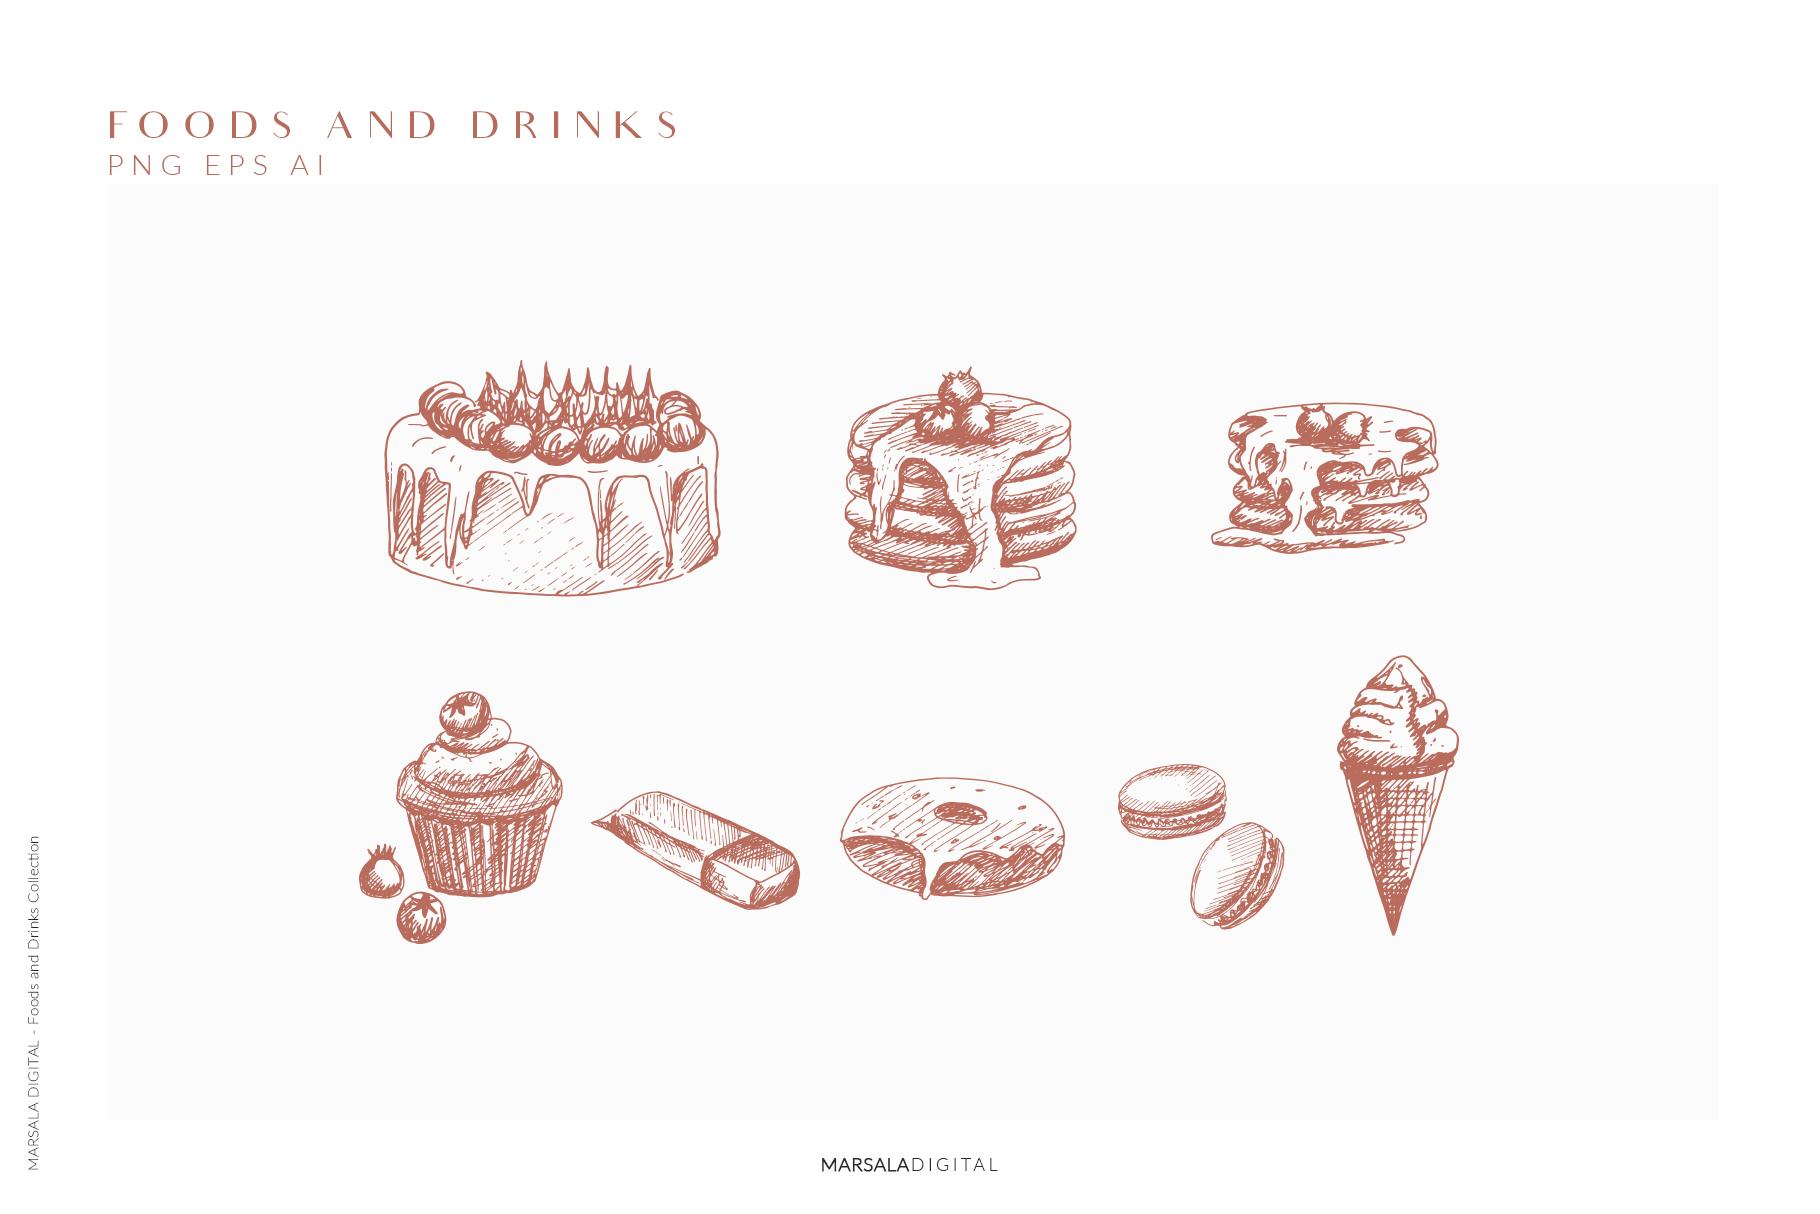 Foods & Drinks Logo Elements Handrawn Graphics example image 10